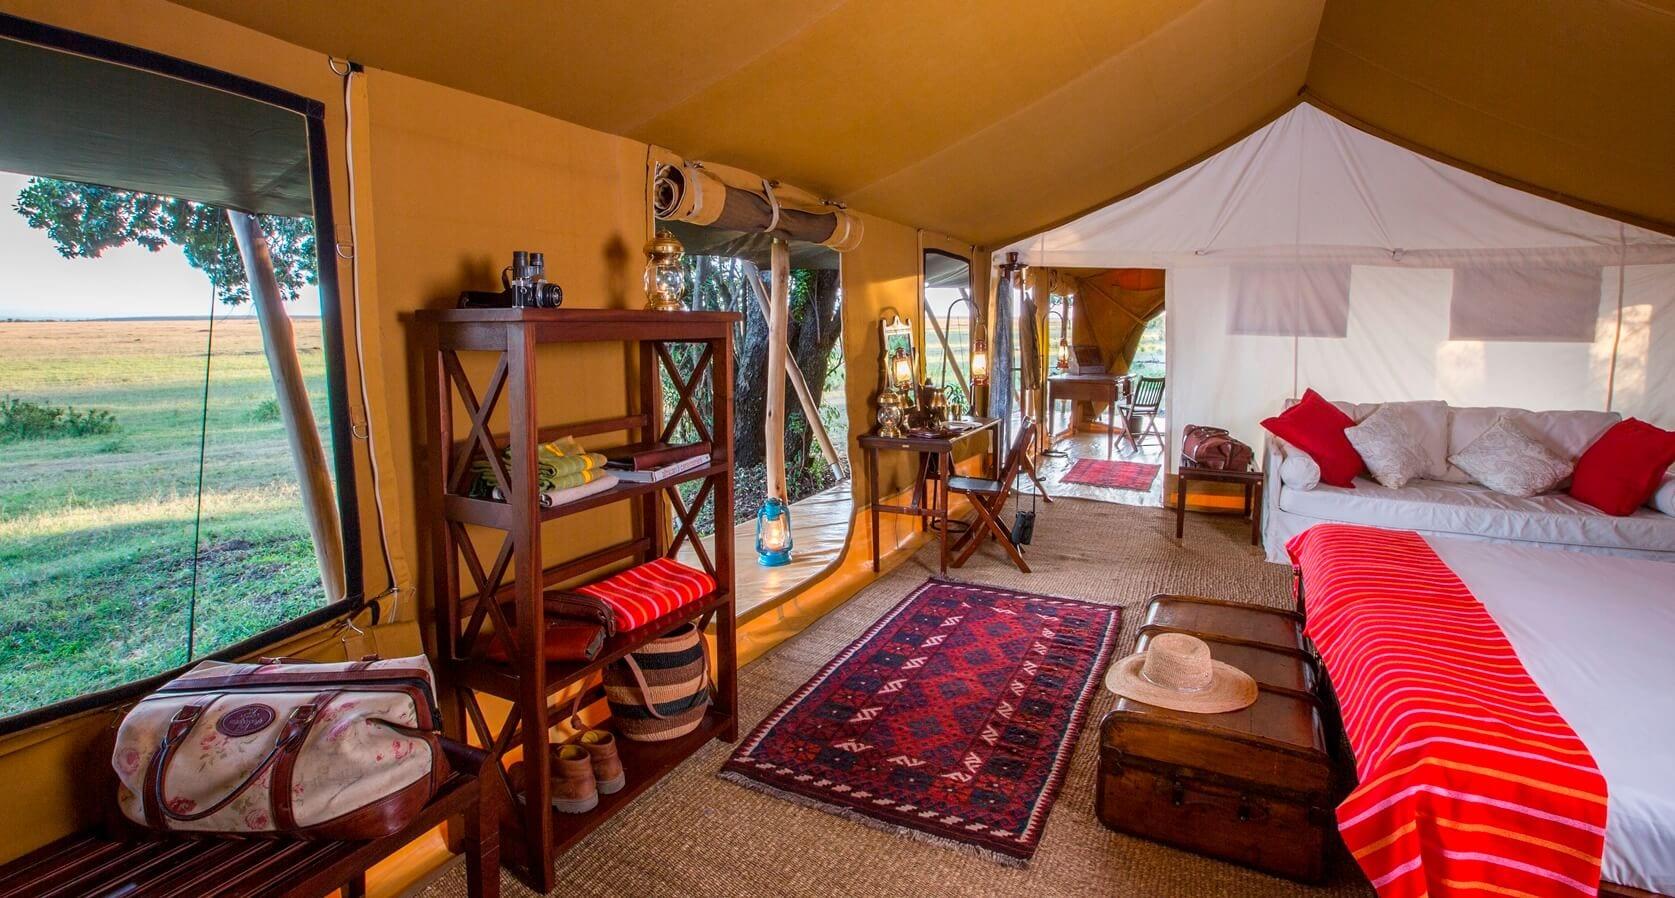 elephant_pepper_camp_-_accommodation_-_family__honeymoontent_-_bedroom_csilverless-3